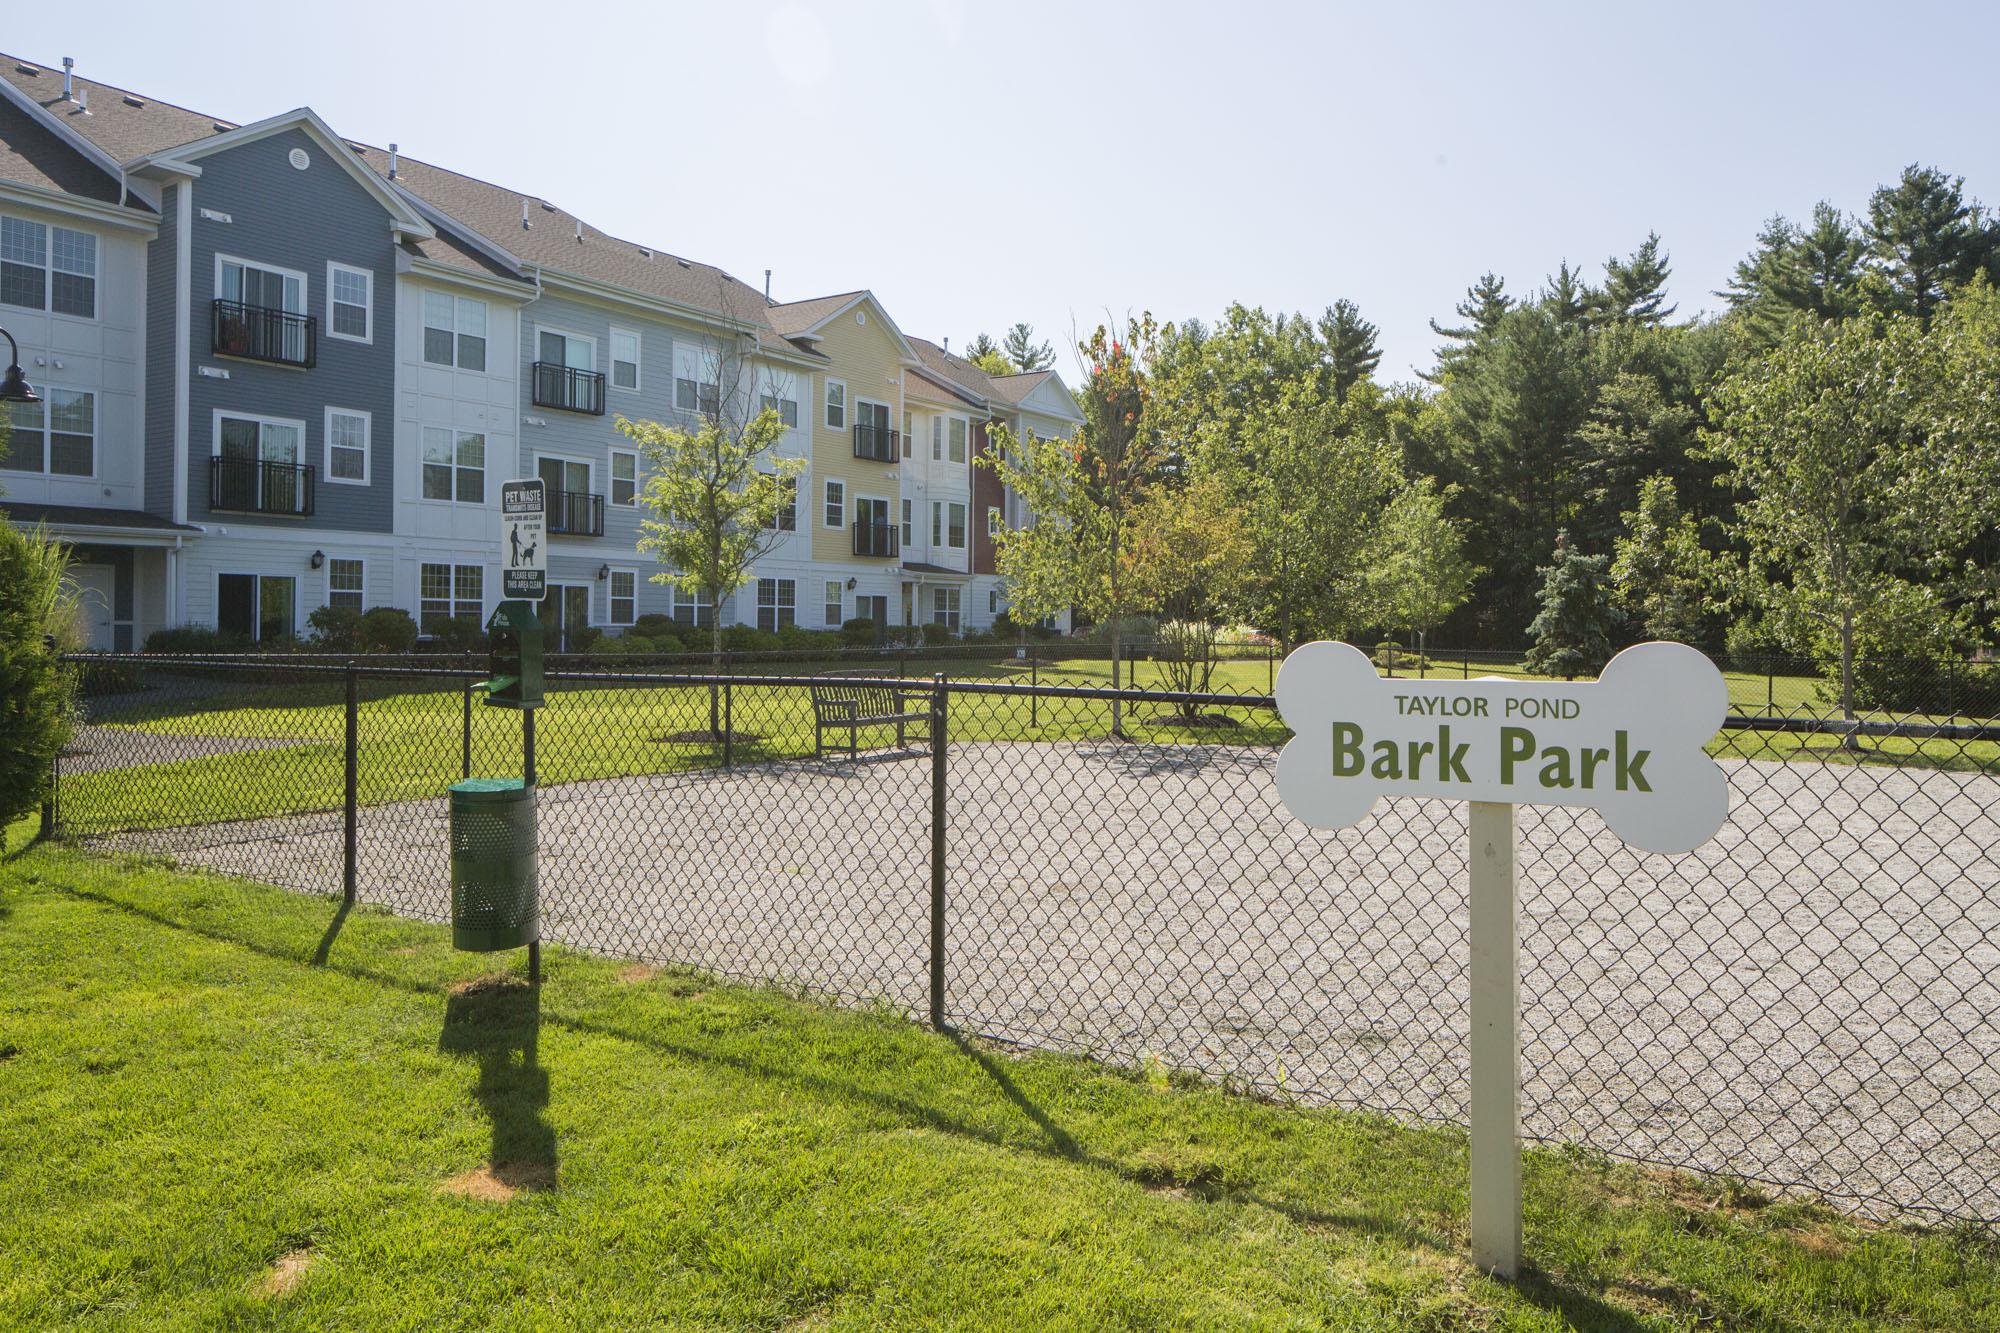 Bark Park at The Village at Taylor Pond